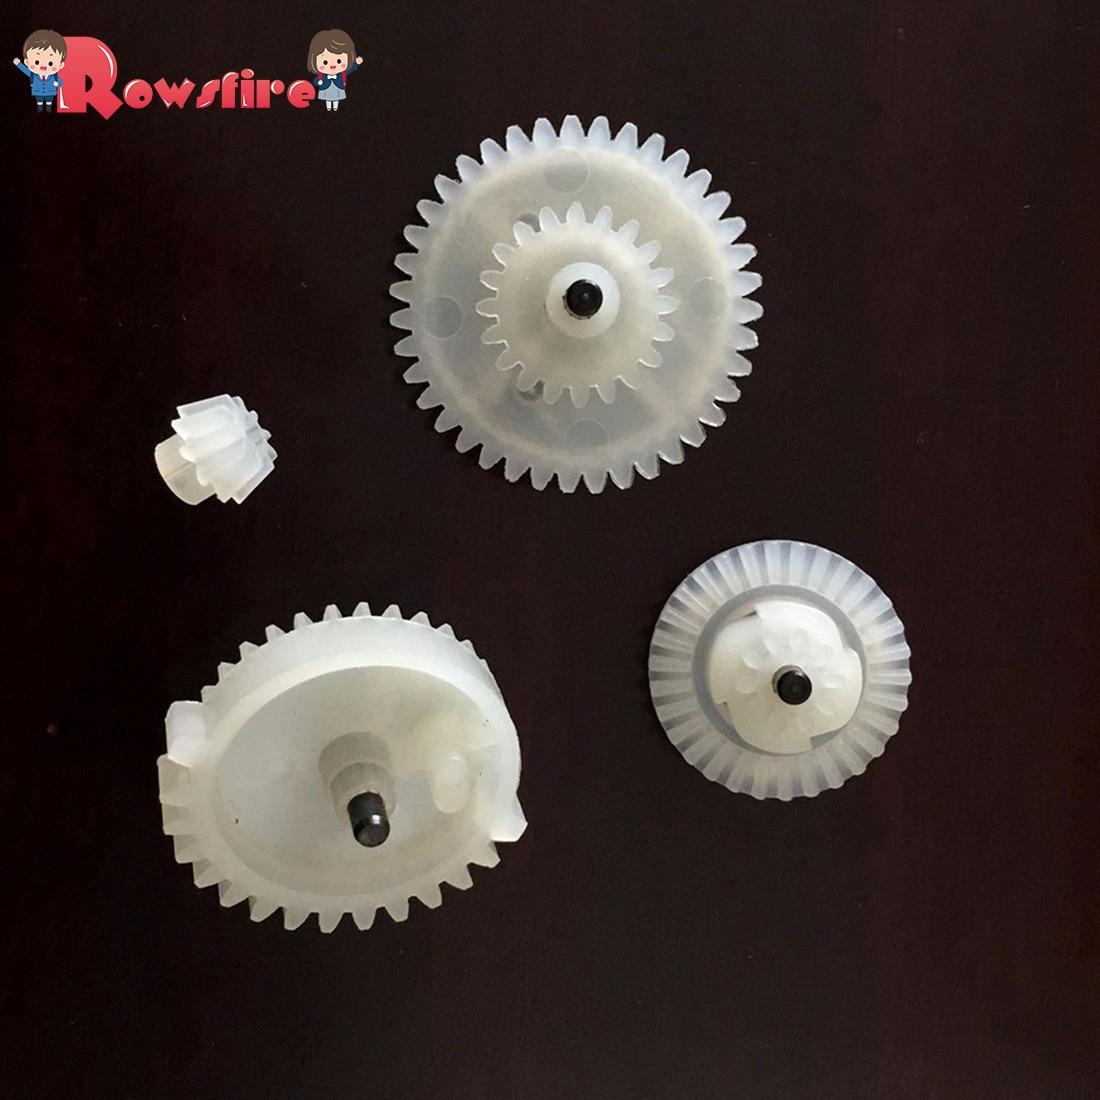 Original Gear Set For XWE M-4 Water Gel Beads Blaster - White